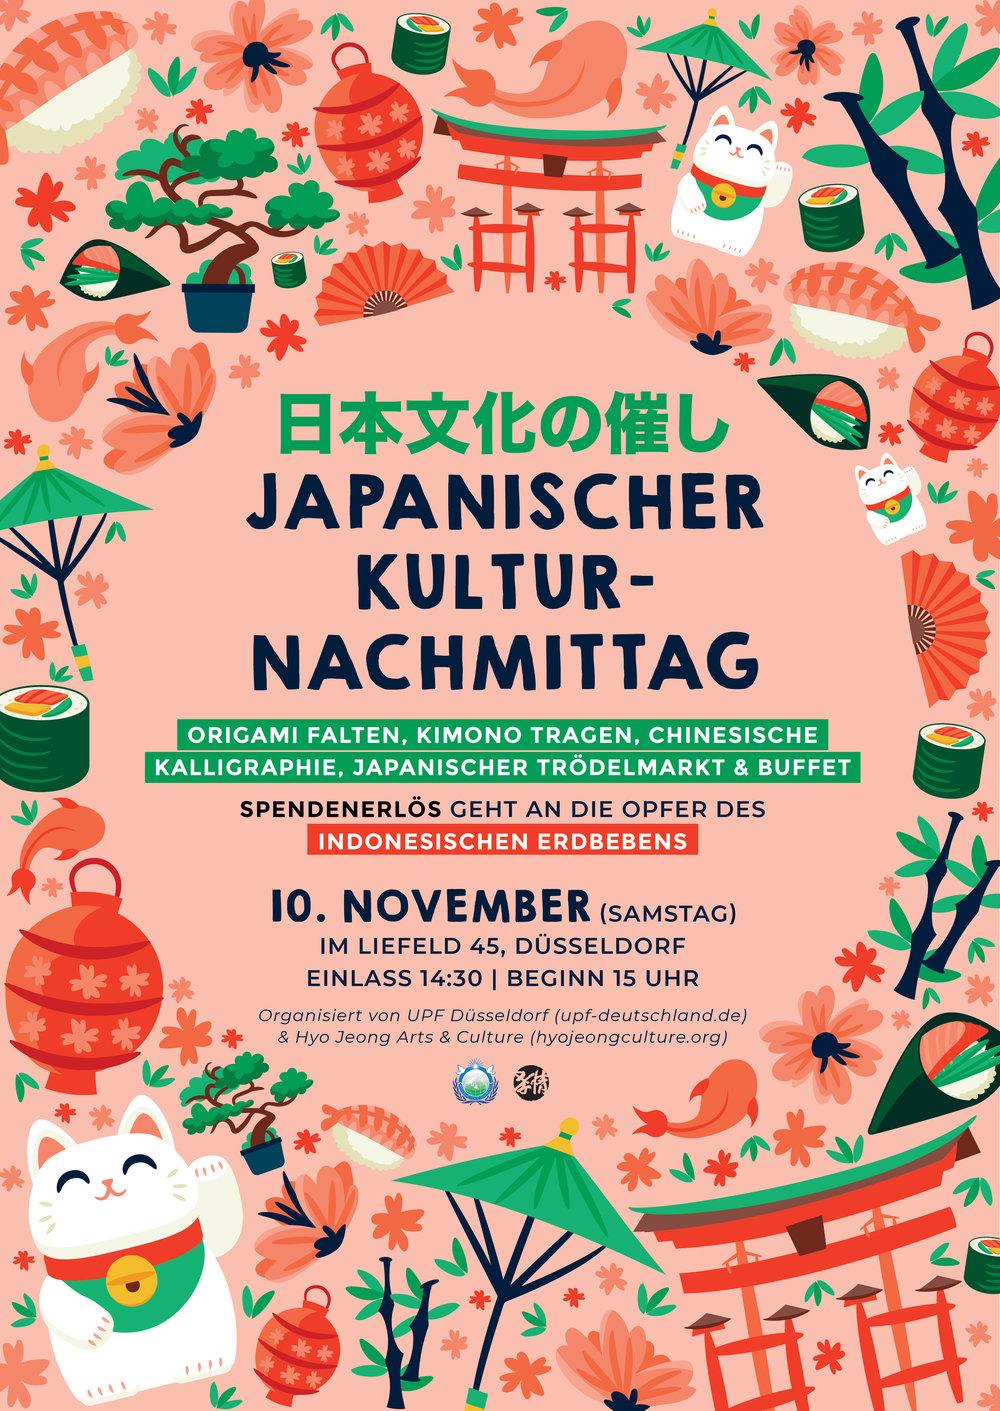 Japanischer-Kulturnachmittag_web.jpg